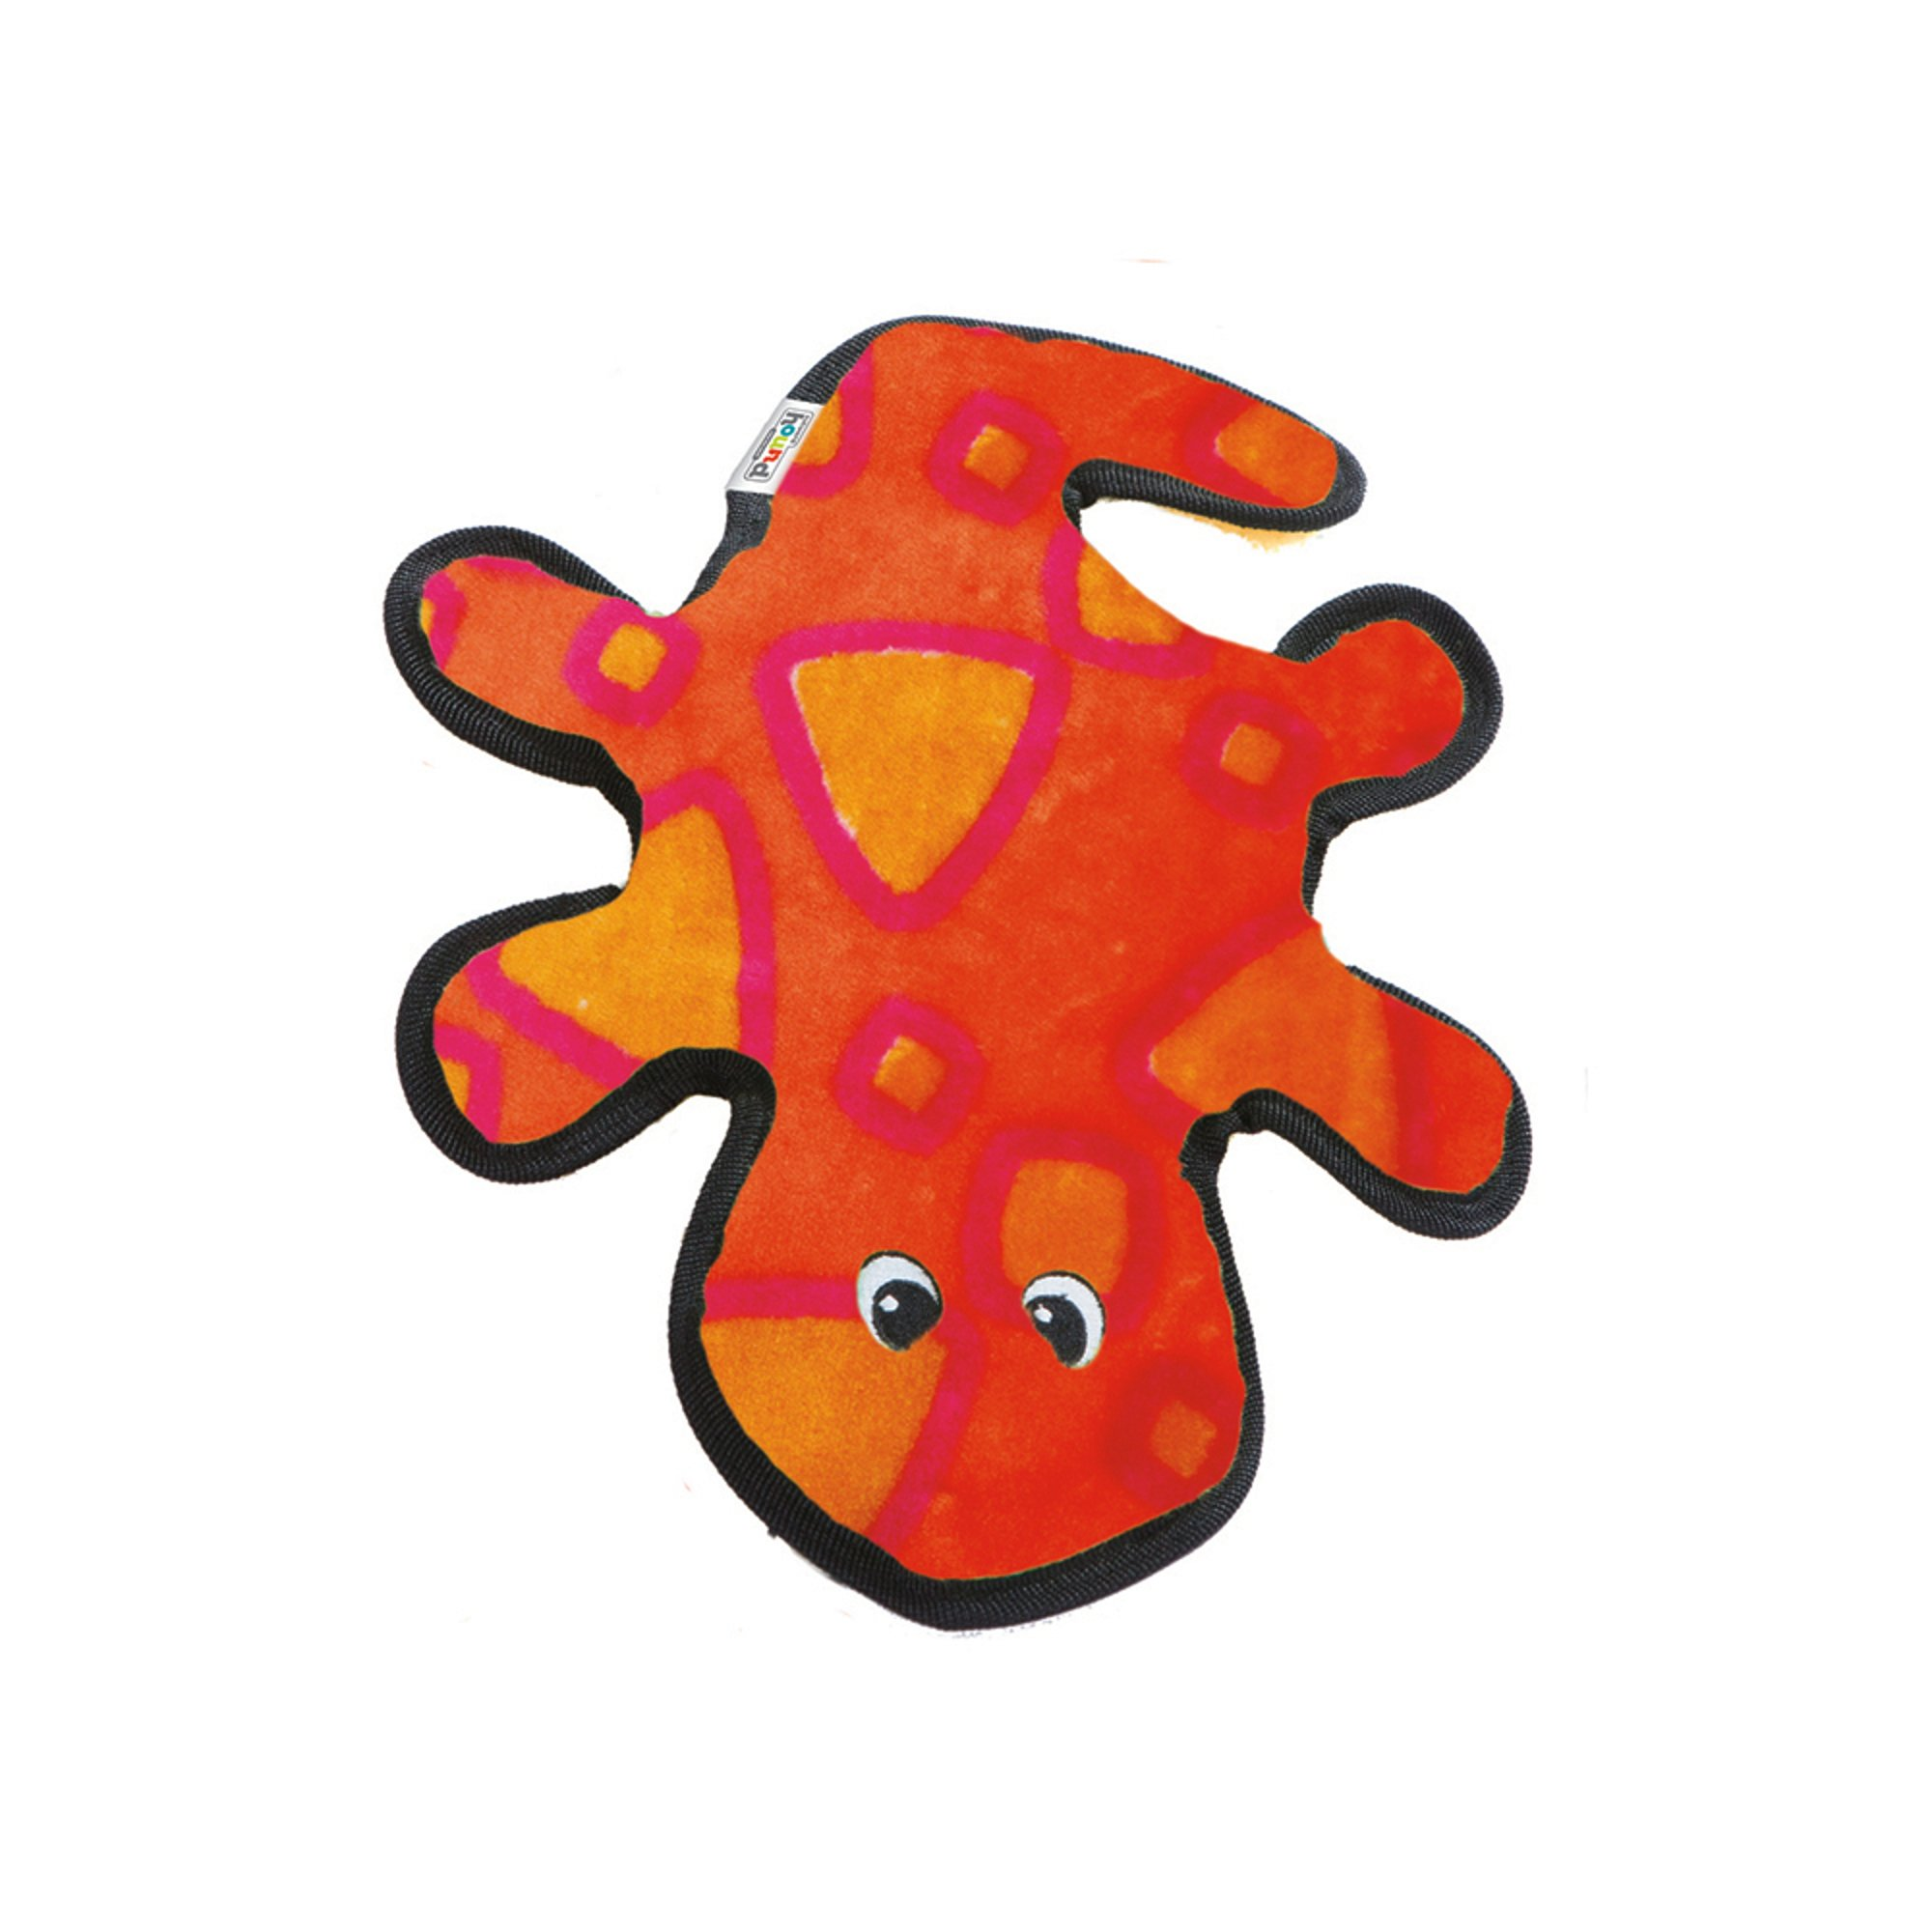 Outward Hound Invincible Red & Orange Gecko Dog Toy